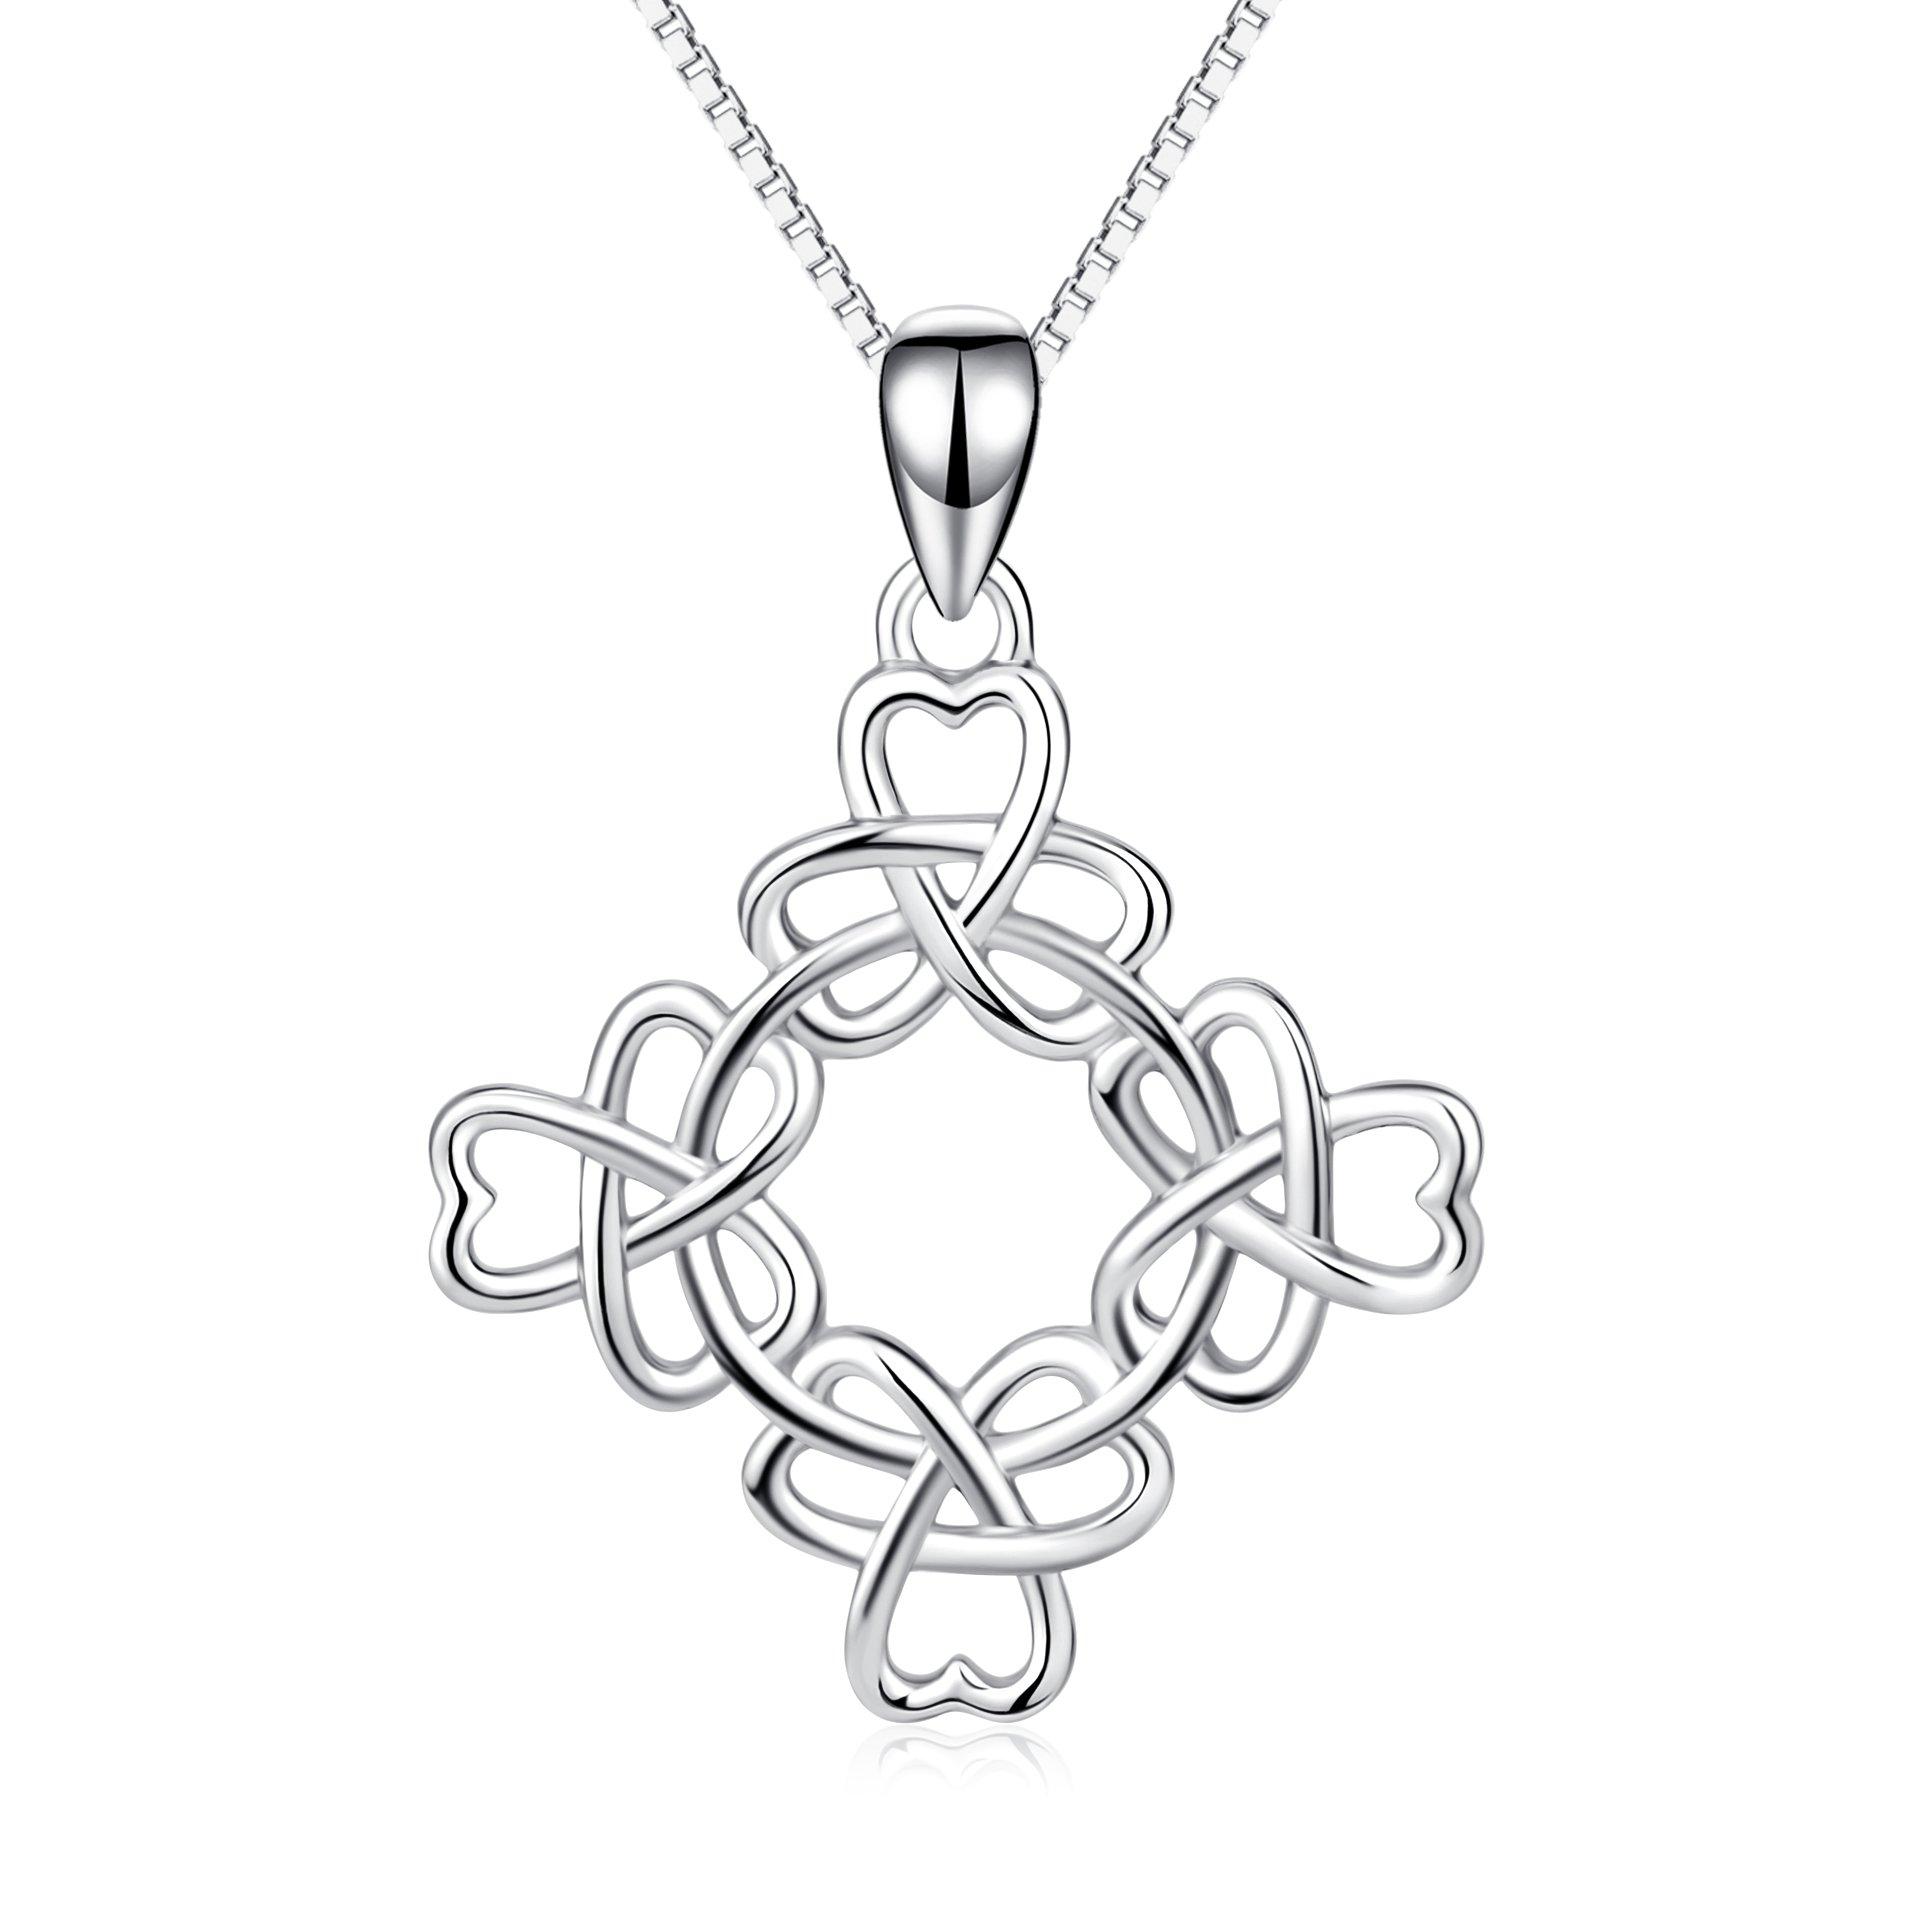 YFN 925 Stering Silver Good Luck Irish Triquetra Celtic Knot Pendant Heart Women Necklace 18'' (Good Luck Clover Knot)